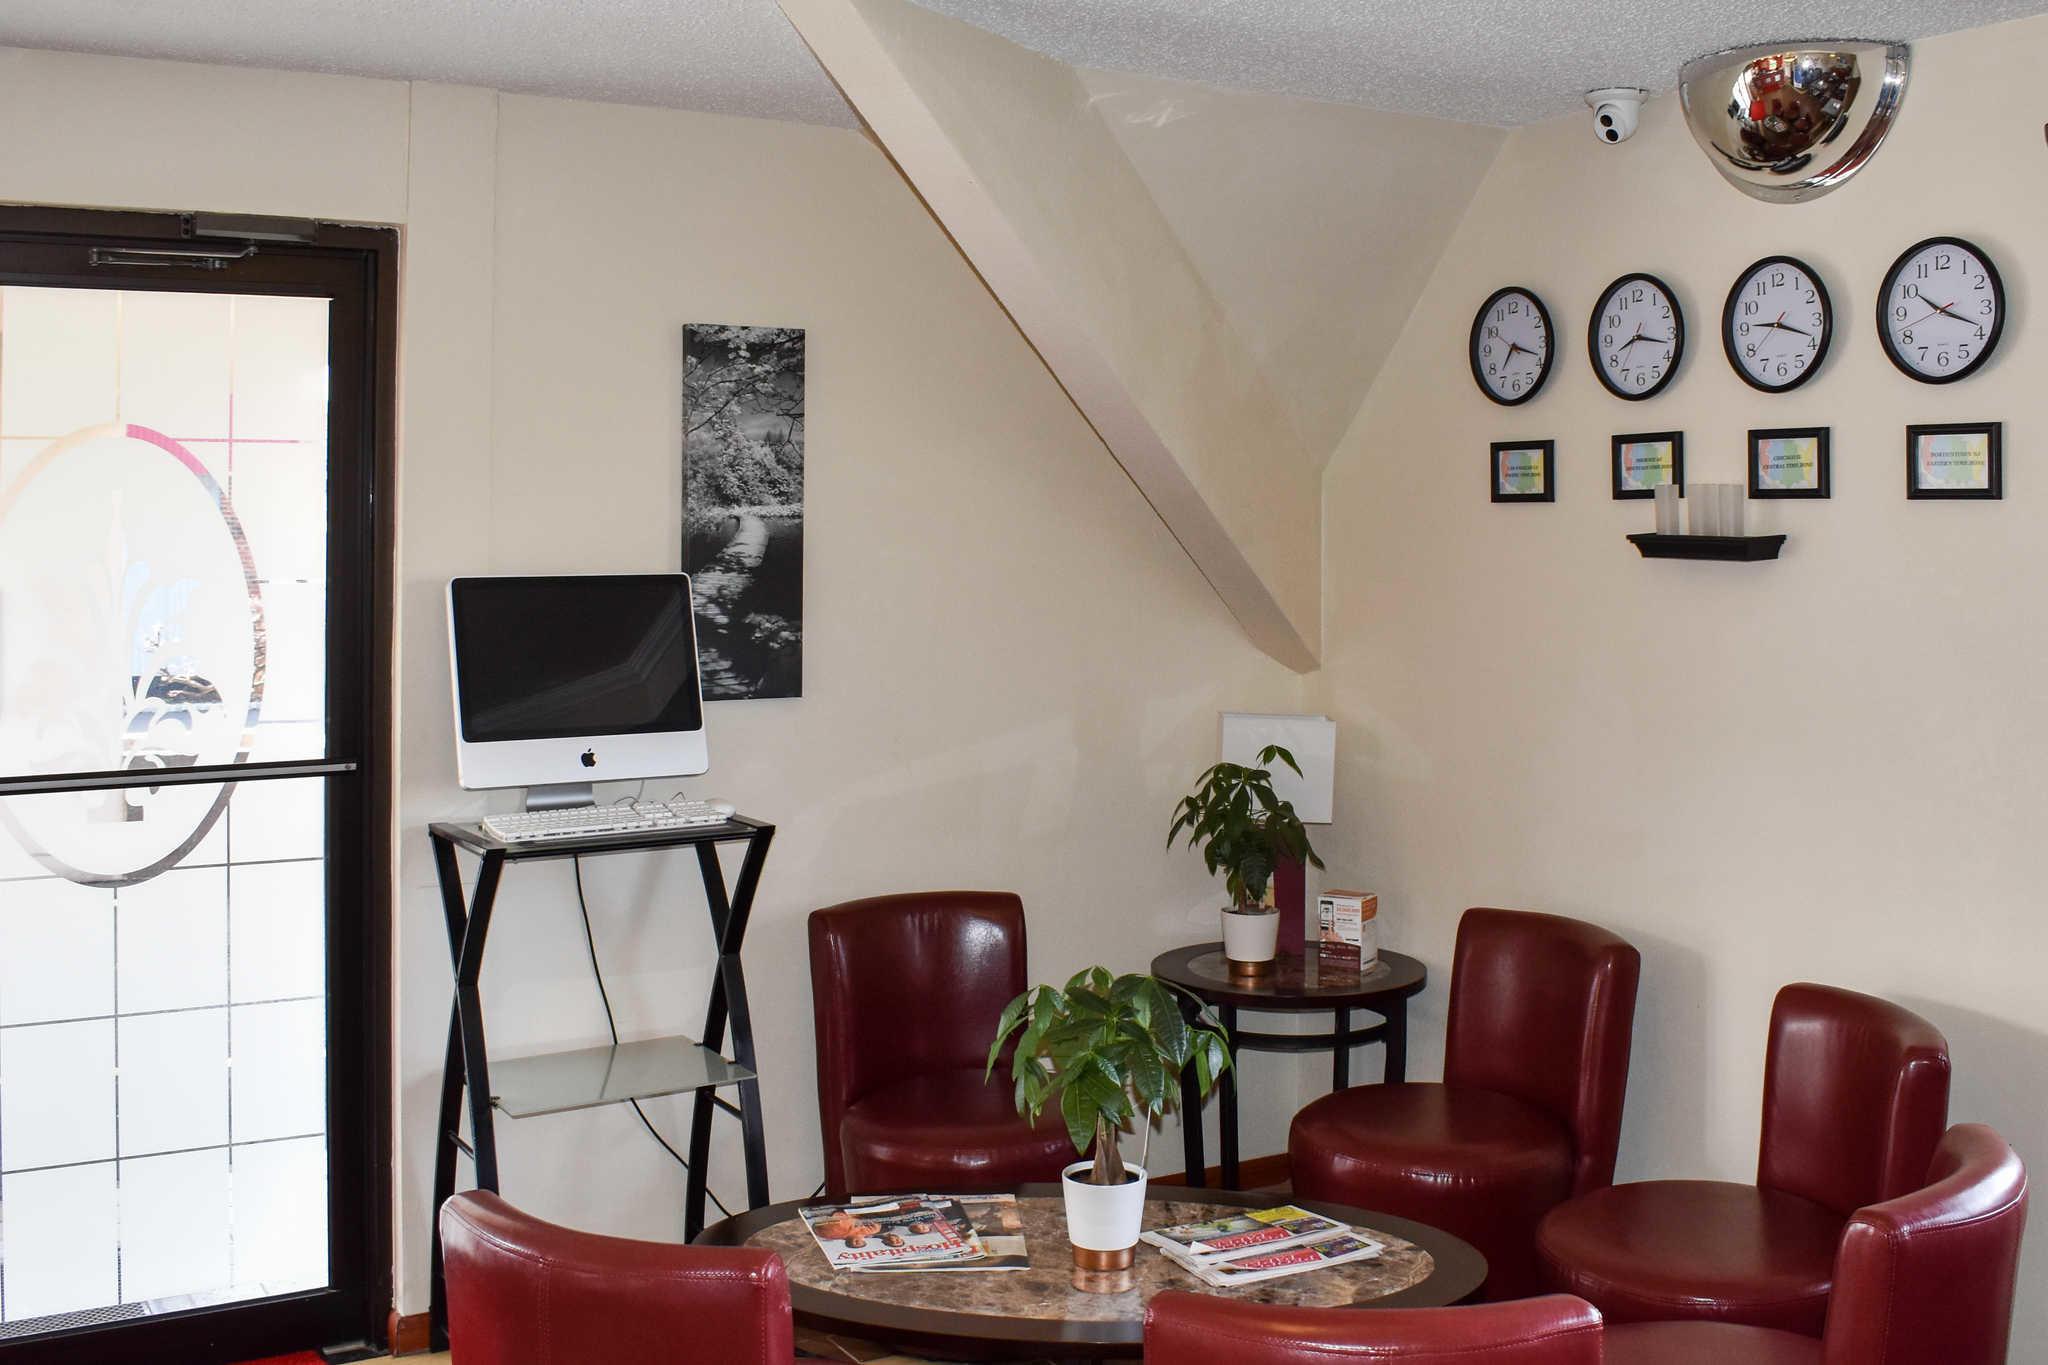 Econo Lodge Inn & Suites - Closed image 26